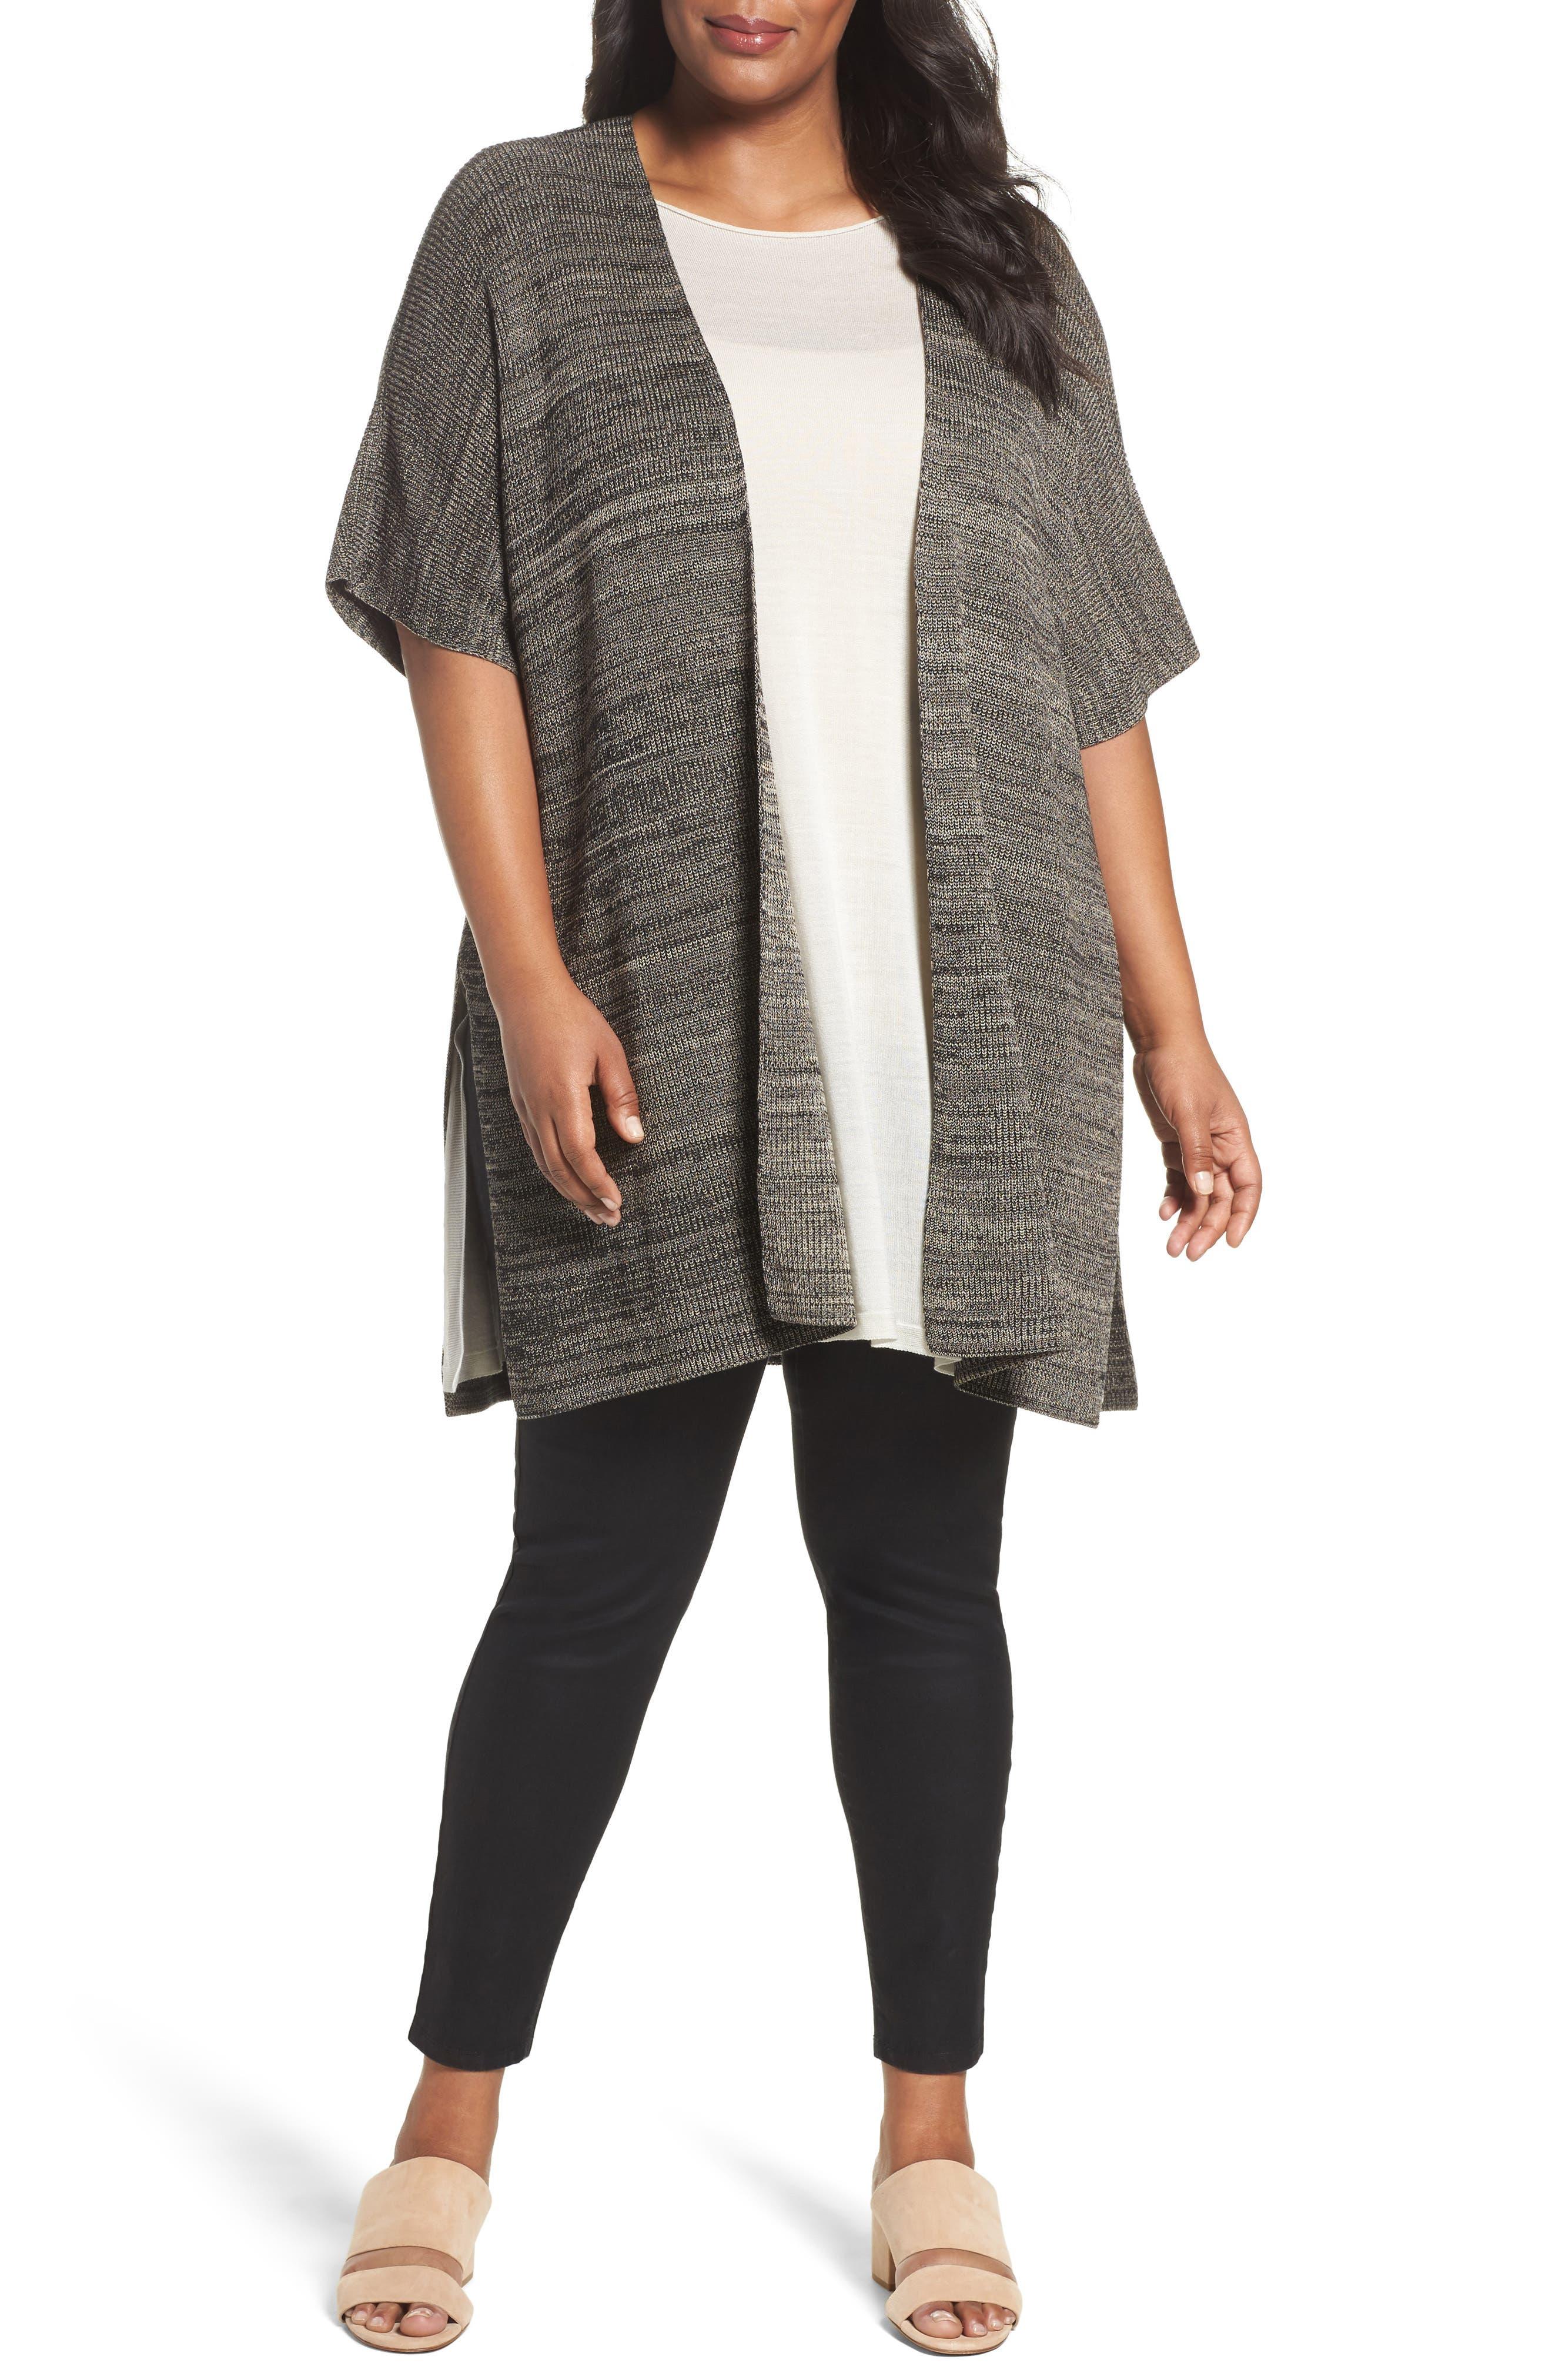 Alternate Image 1 Selected - Eileen Fisher Tencel® Knit Kimono Cardigan (Plus Size)